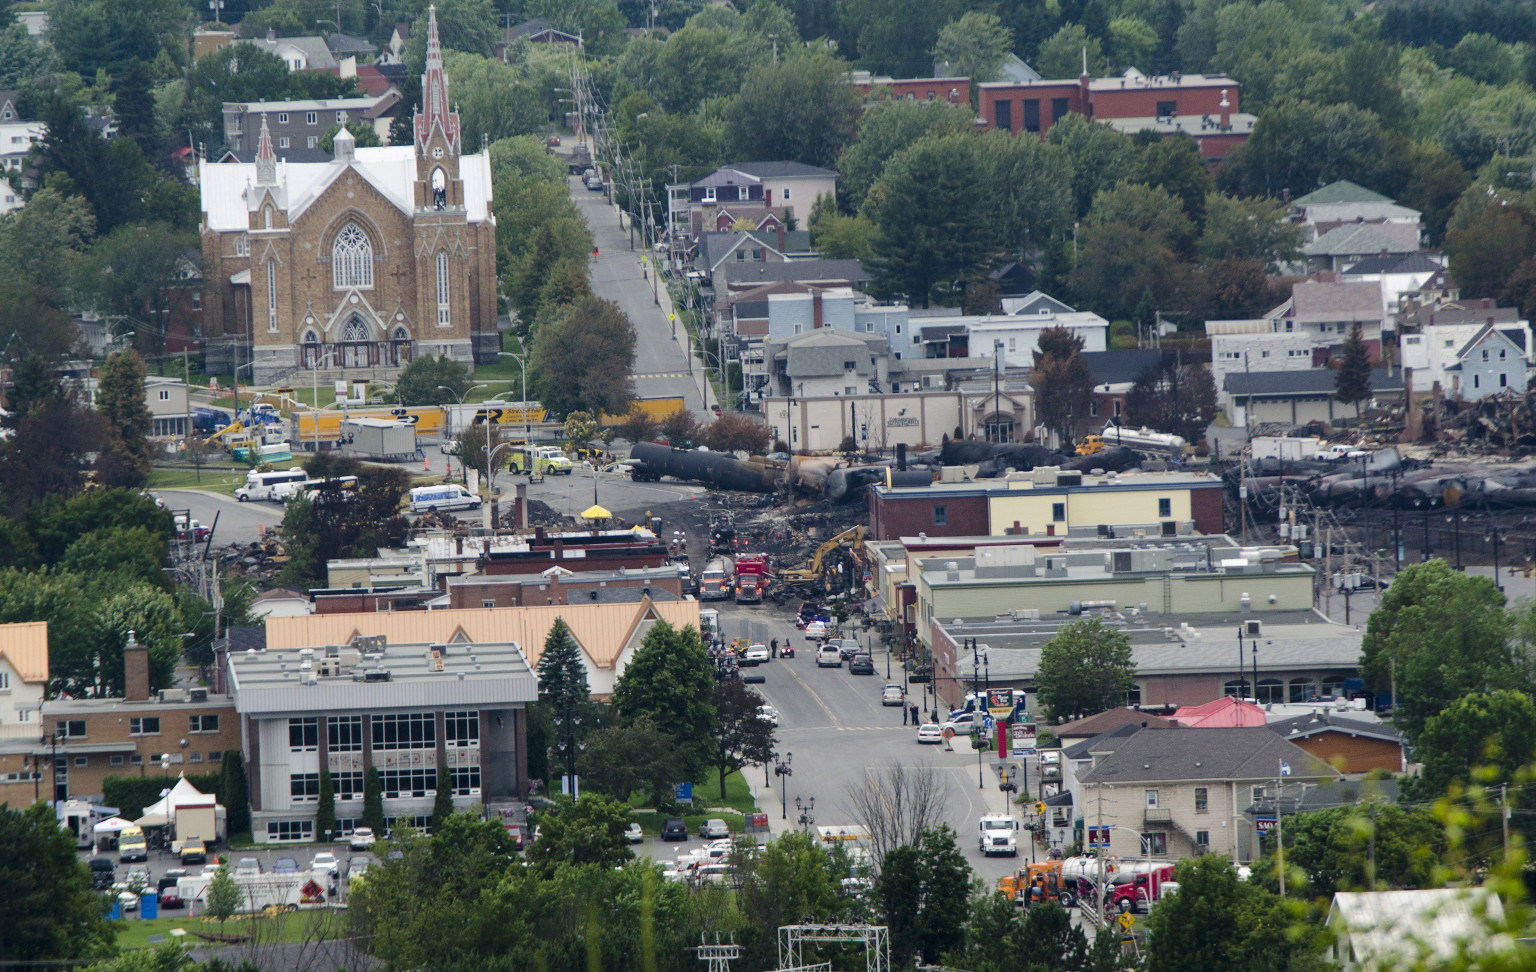 Lac-Megantic: 5 More Bodies Found, 33 Confirmed Dead ...